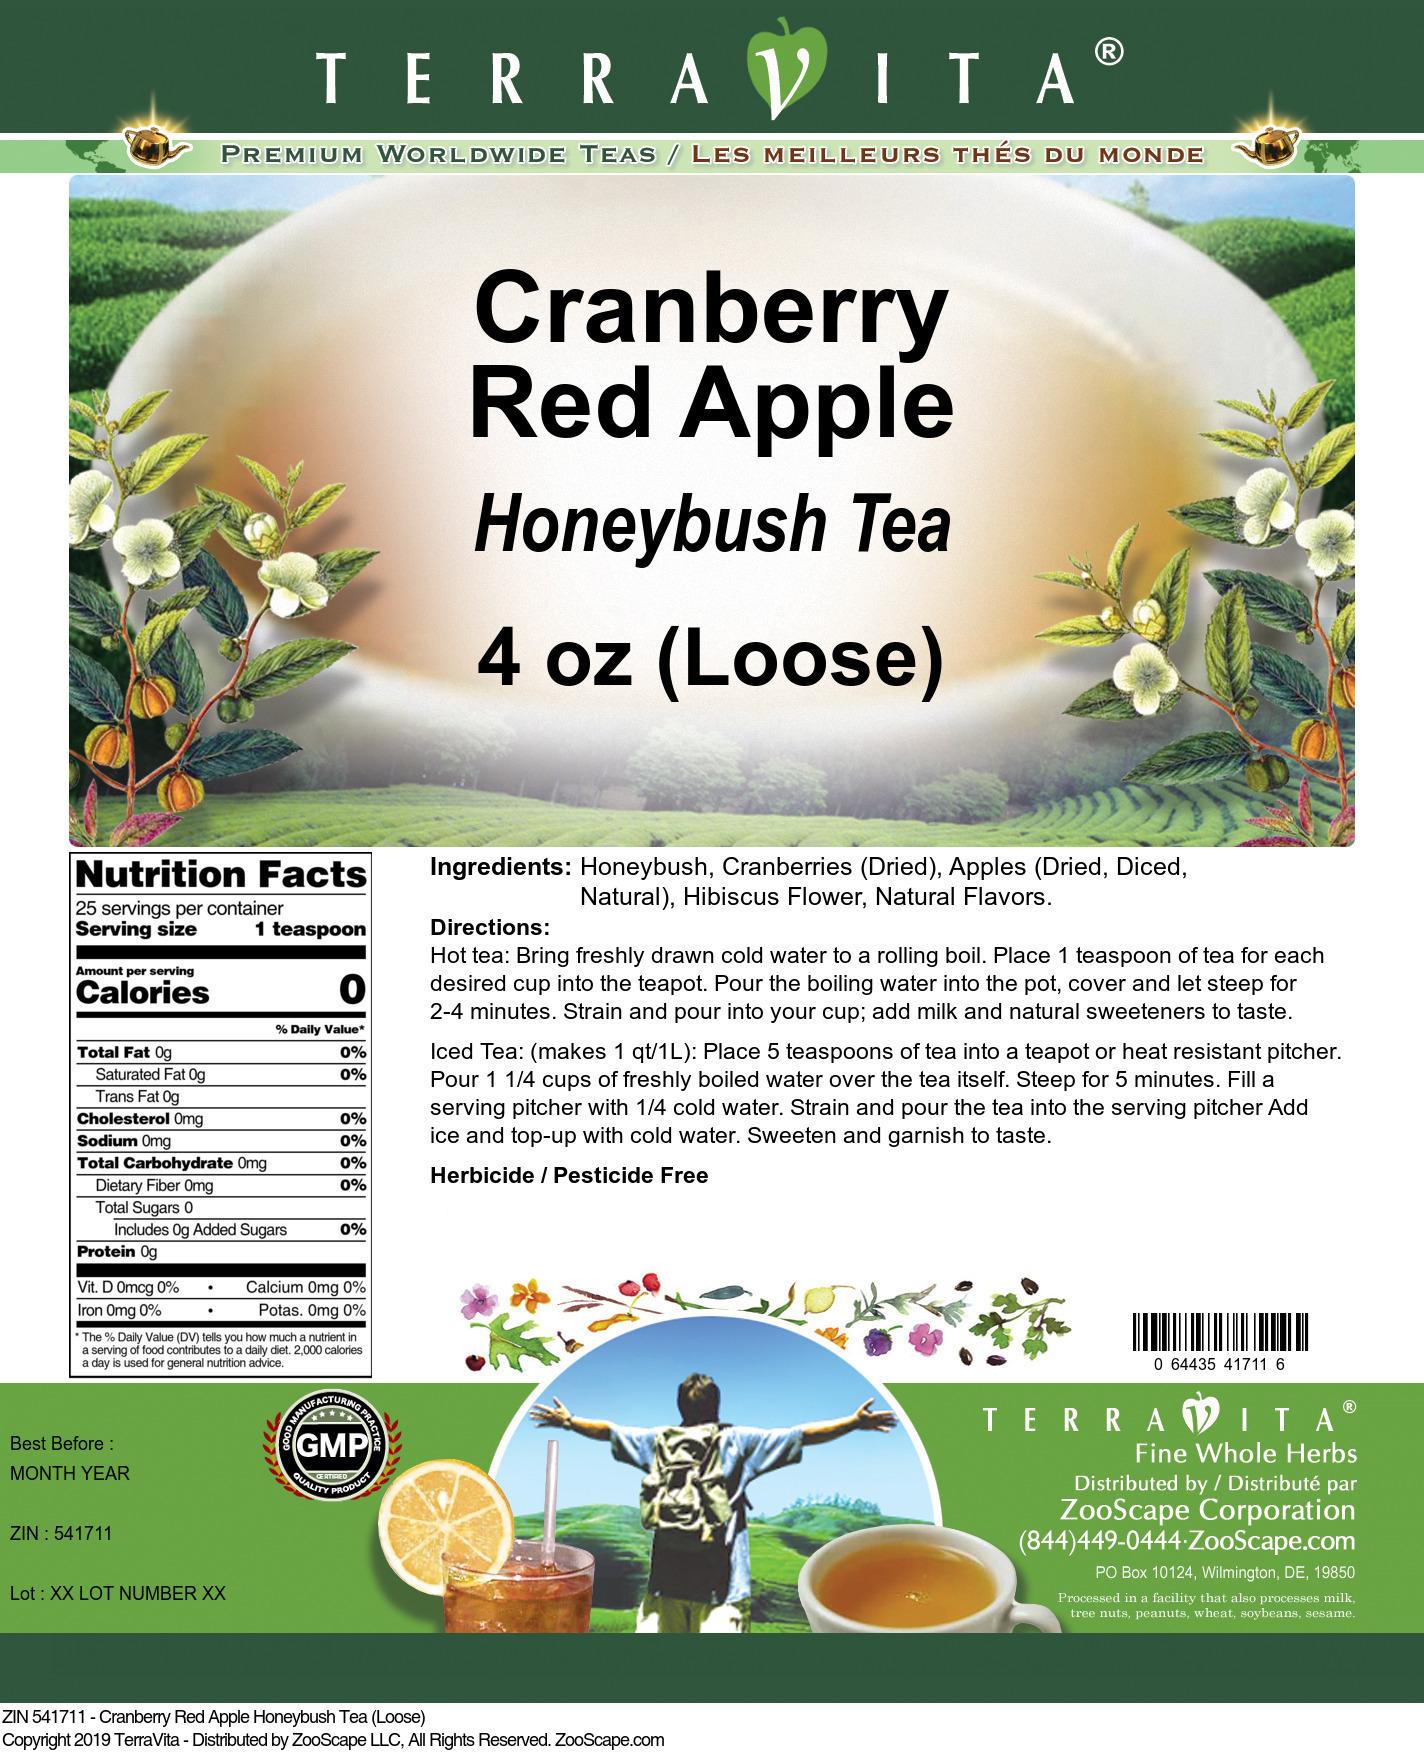 Cranberry Red Apple Honeybush Tea (Loose)